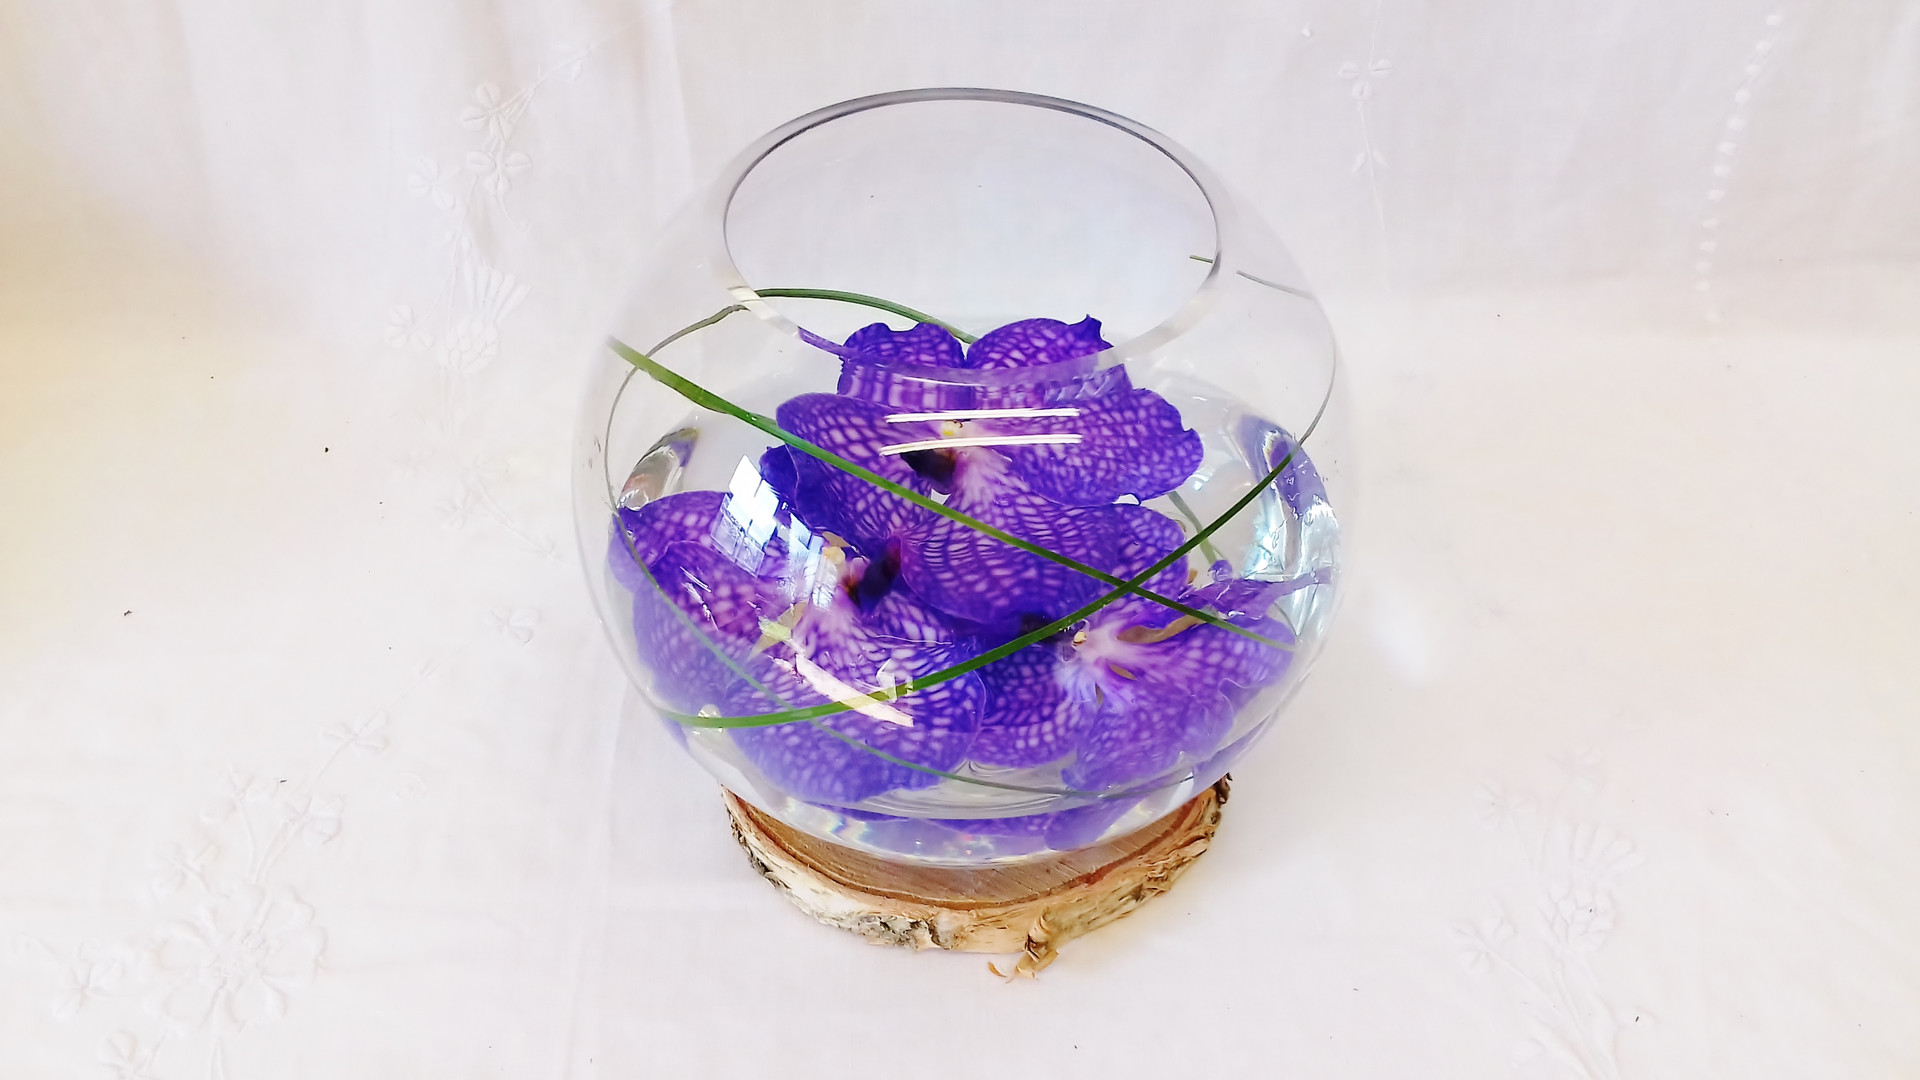 Vanda orchid fish bowl